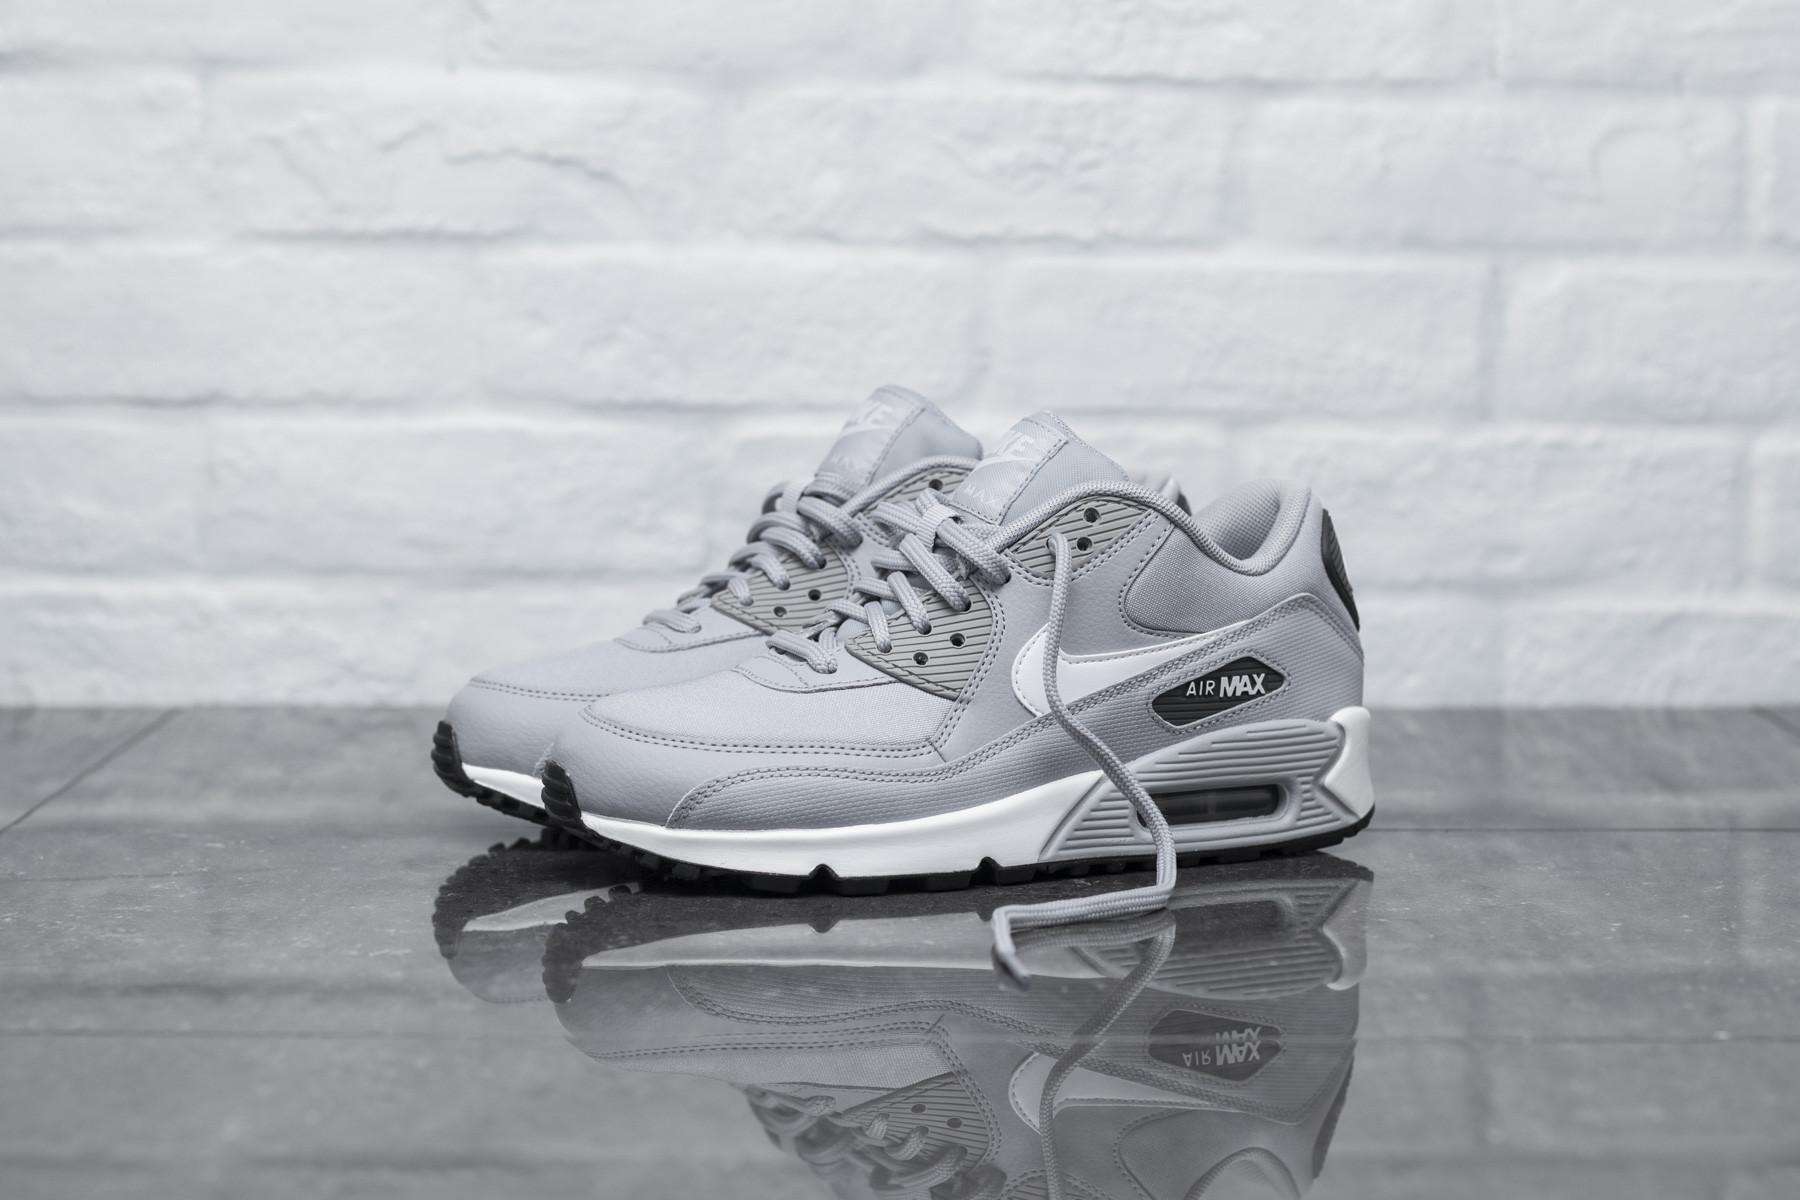 Wmns Air Max 90 Greywhite dark Grey black